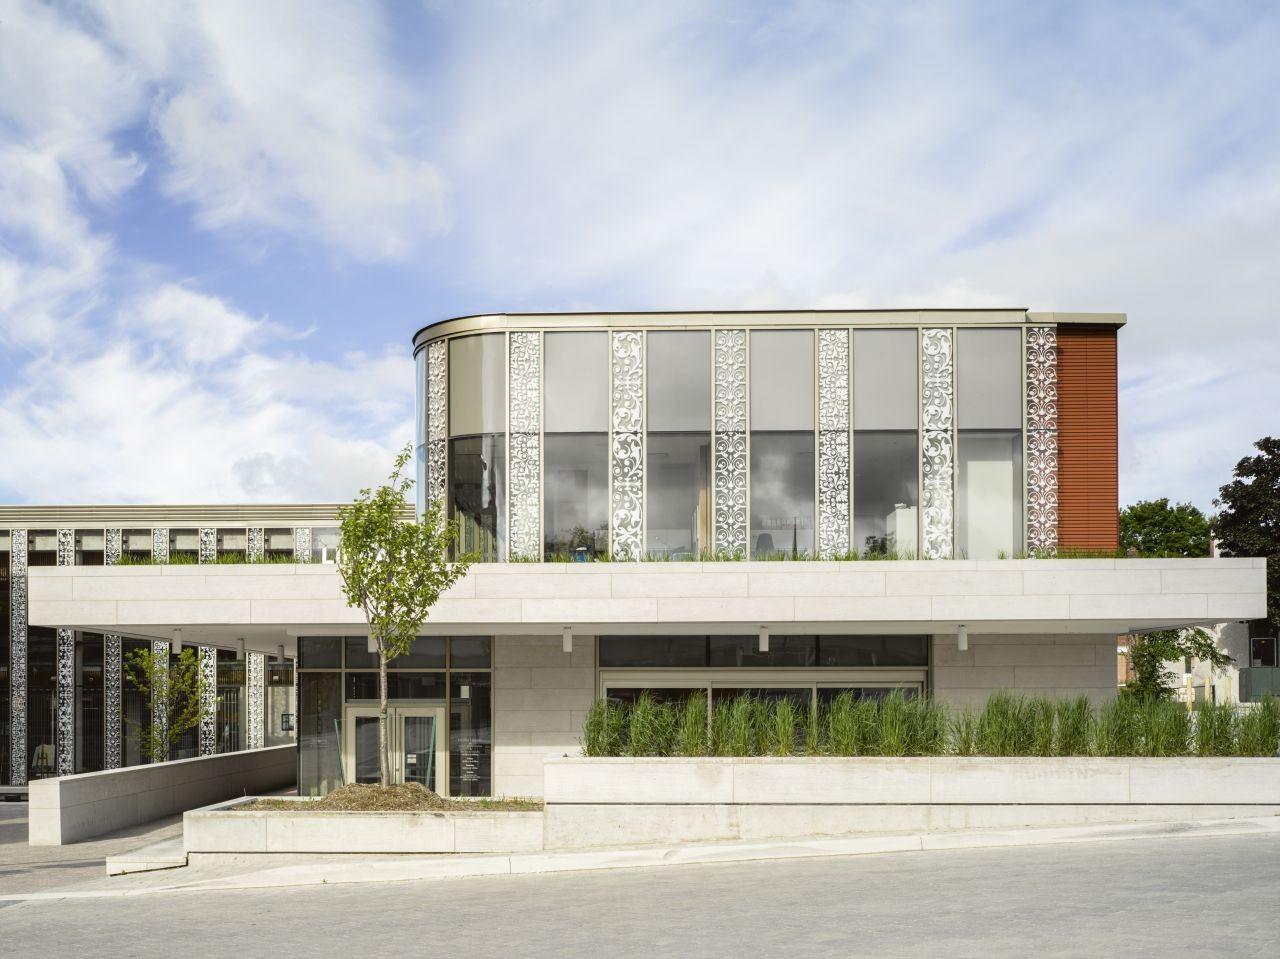 Orillia Public Library / Perkins+Will, © Ben Rahn / A-Frame